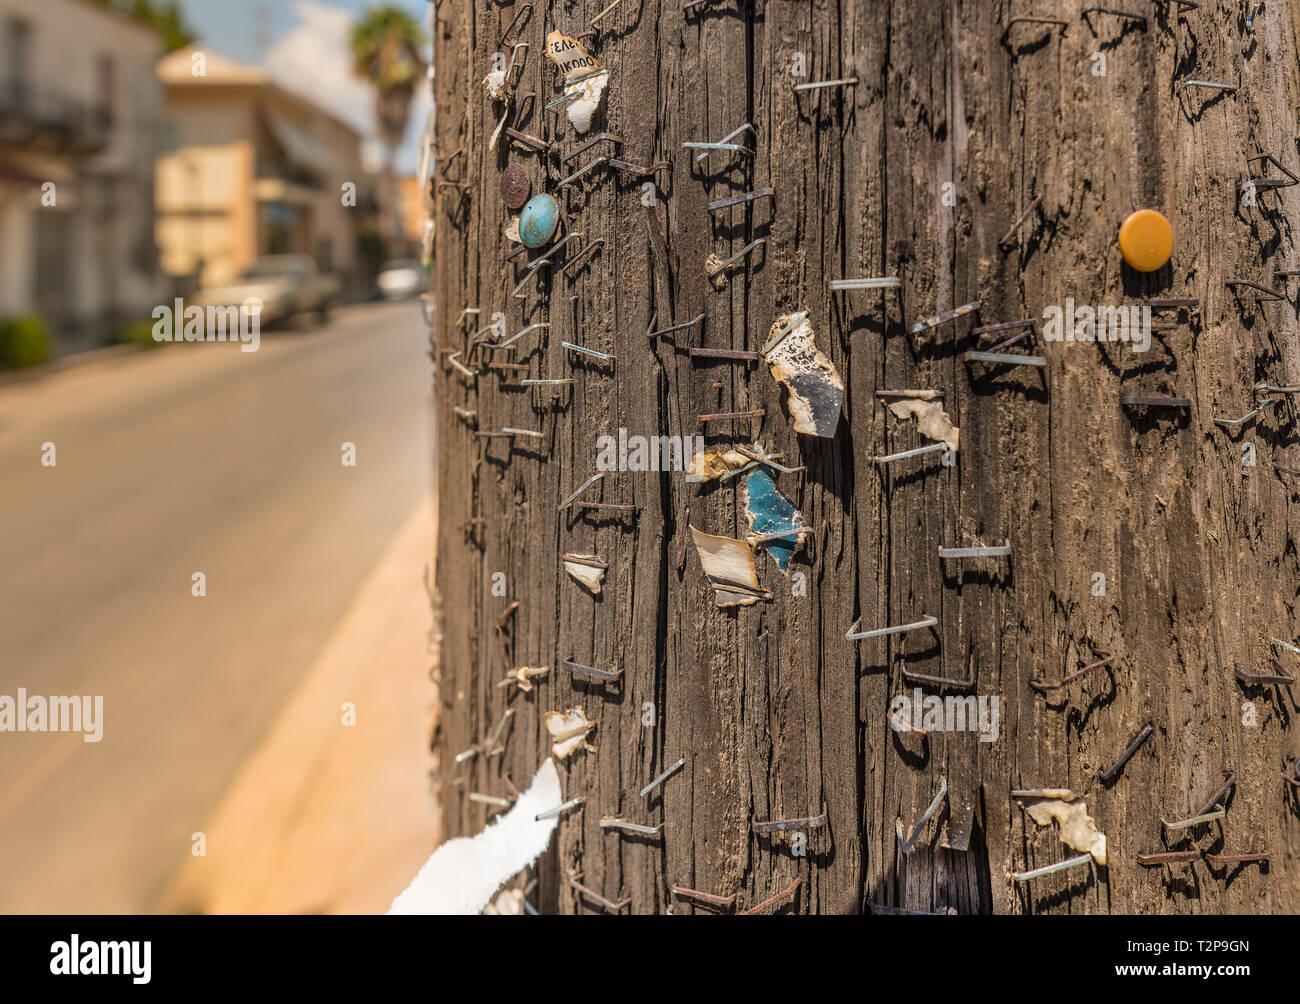 many staples on a telephone mast - Stock Image